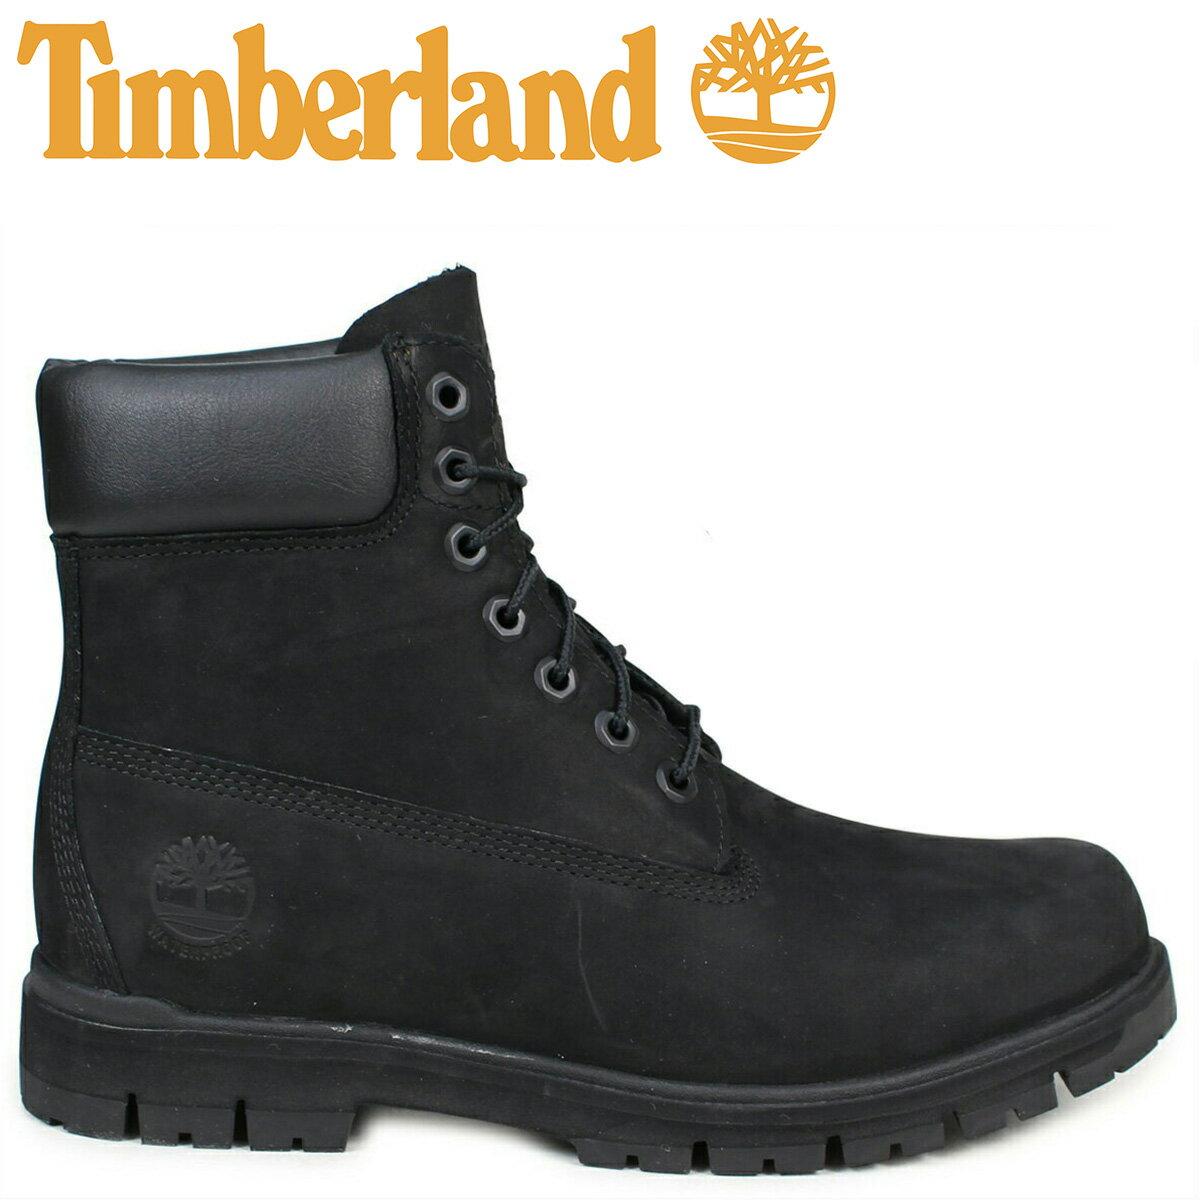 Timberland ブーツ メンズ 6インチ ティンバーランド RADFORD 6INCH PREMIUM BOOT A1JI2 ウォータープルーフ Wワイズ 防水 ブラック [予約商品 7/25頃入荷予定 追加入荷]